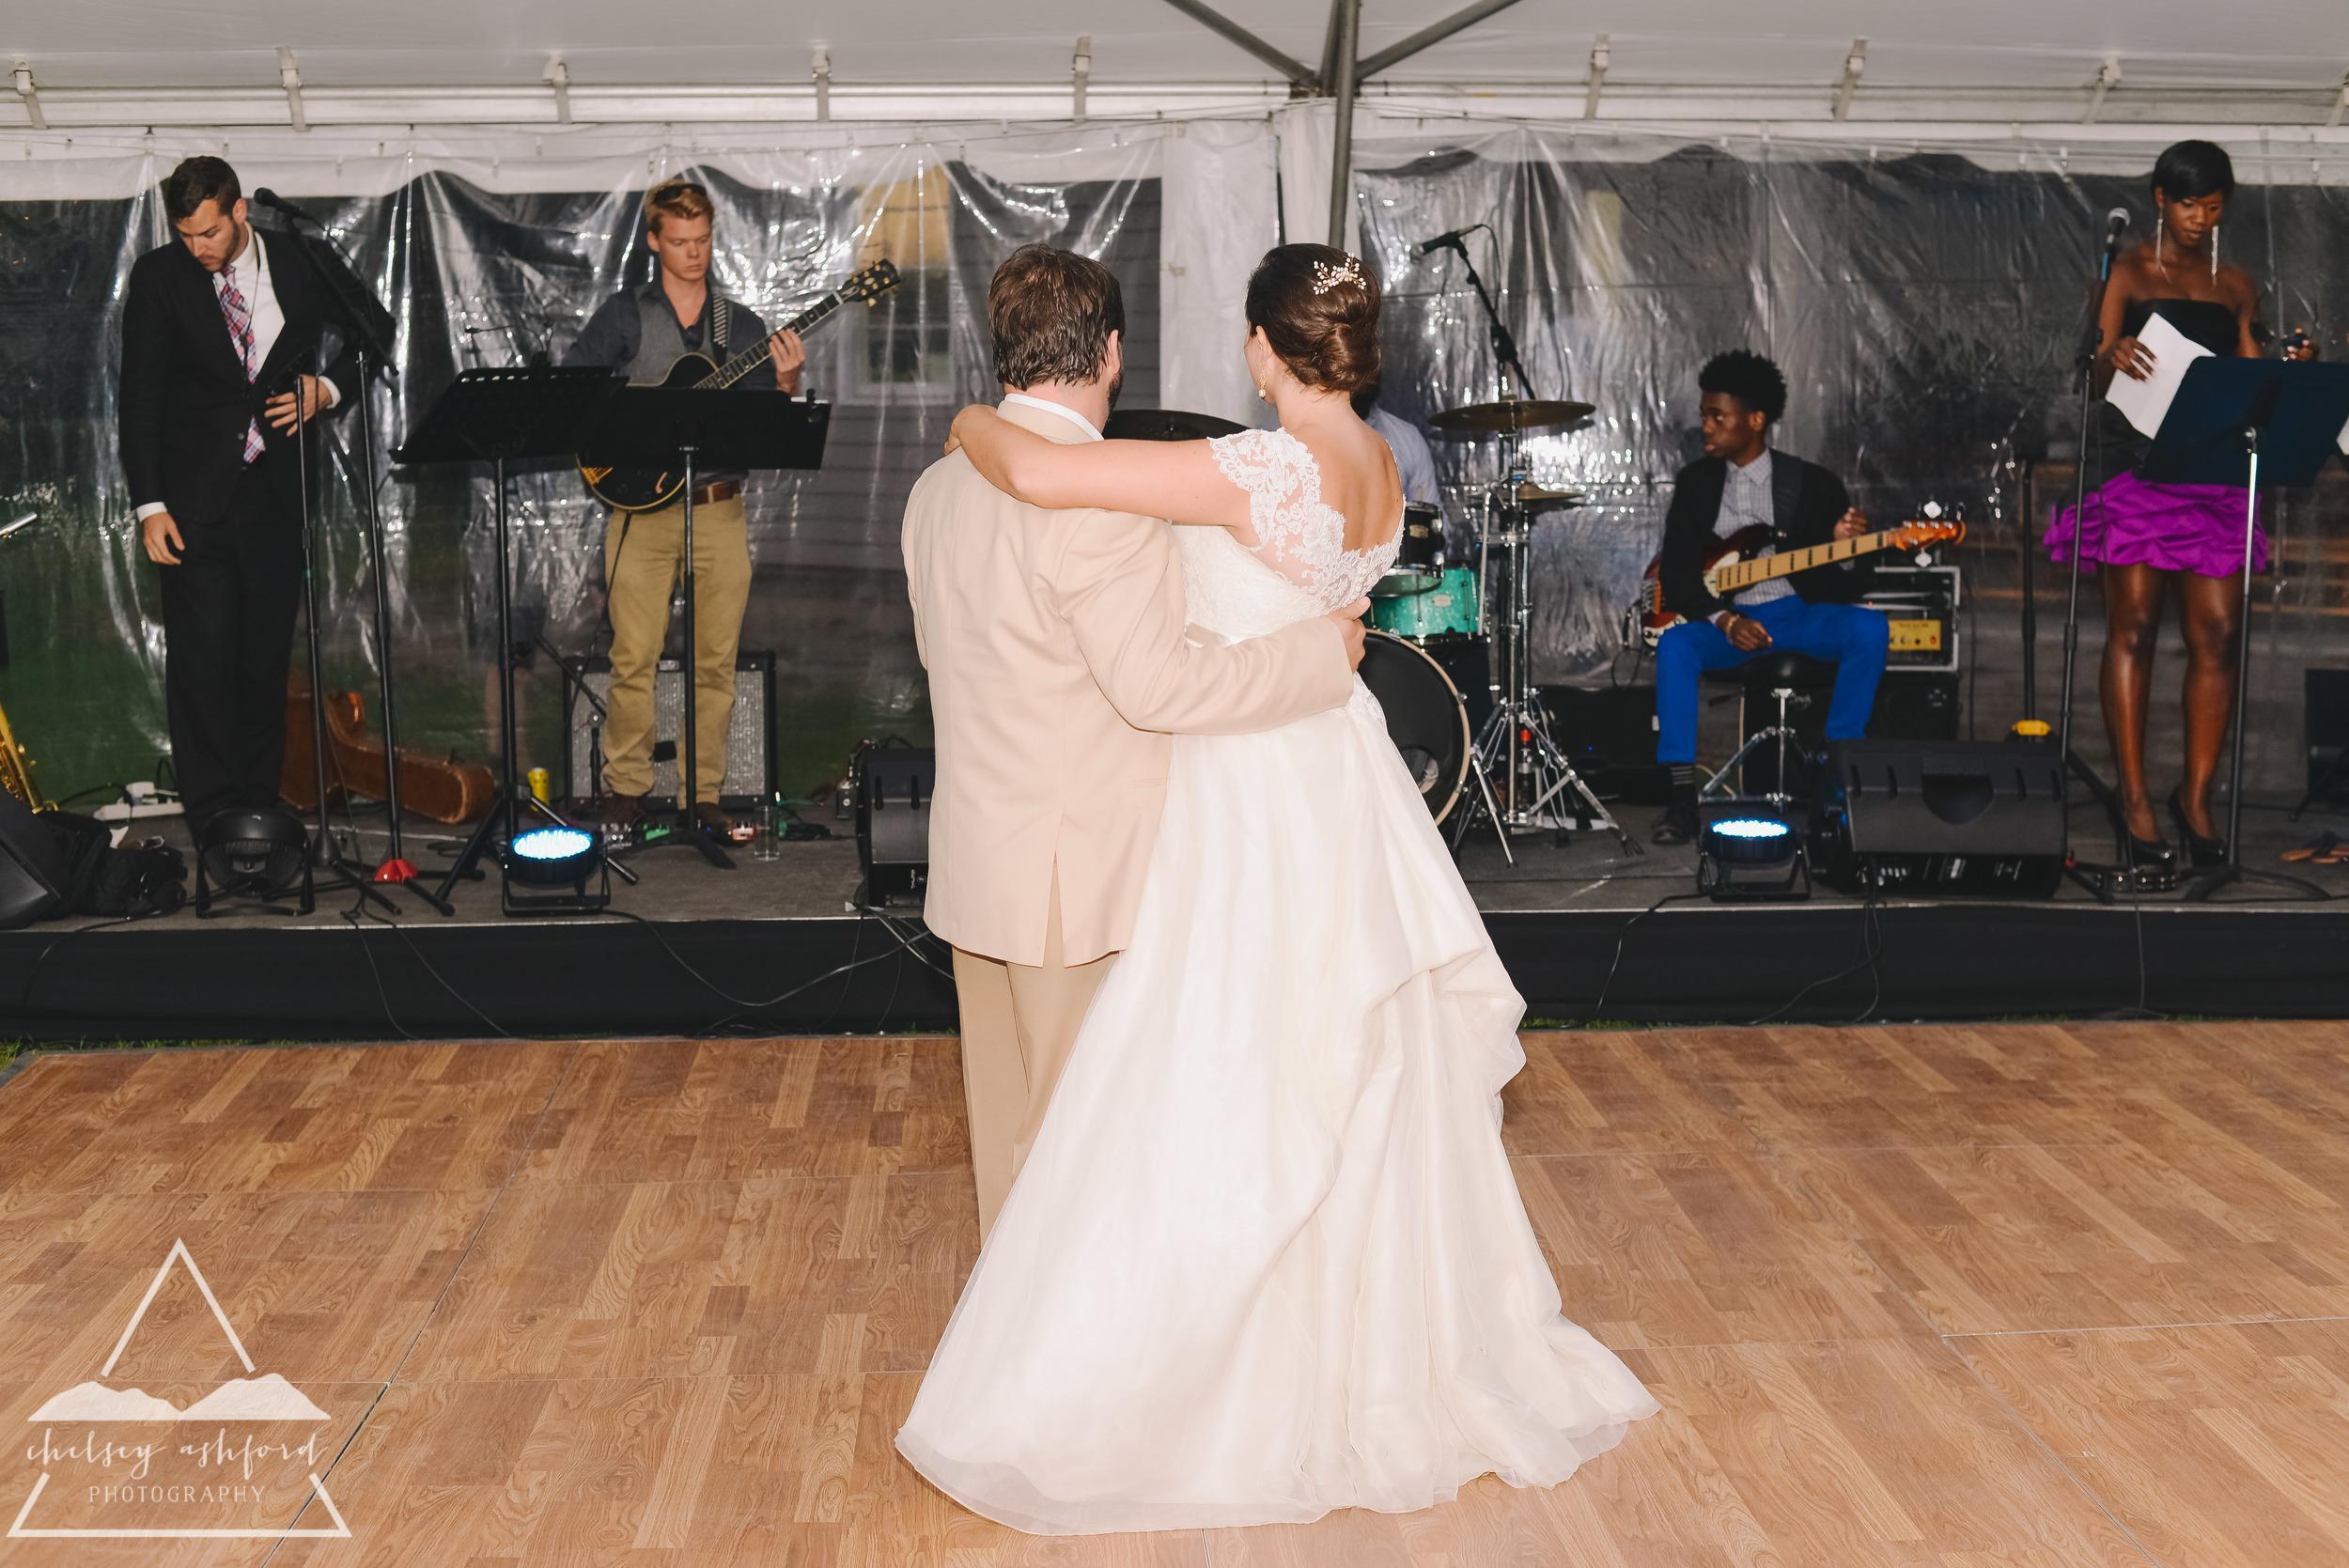 Clarkson_wedding_web-158.jpg